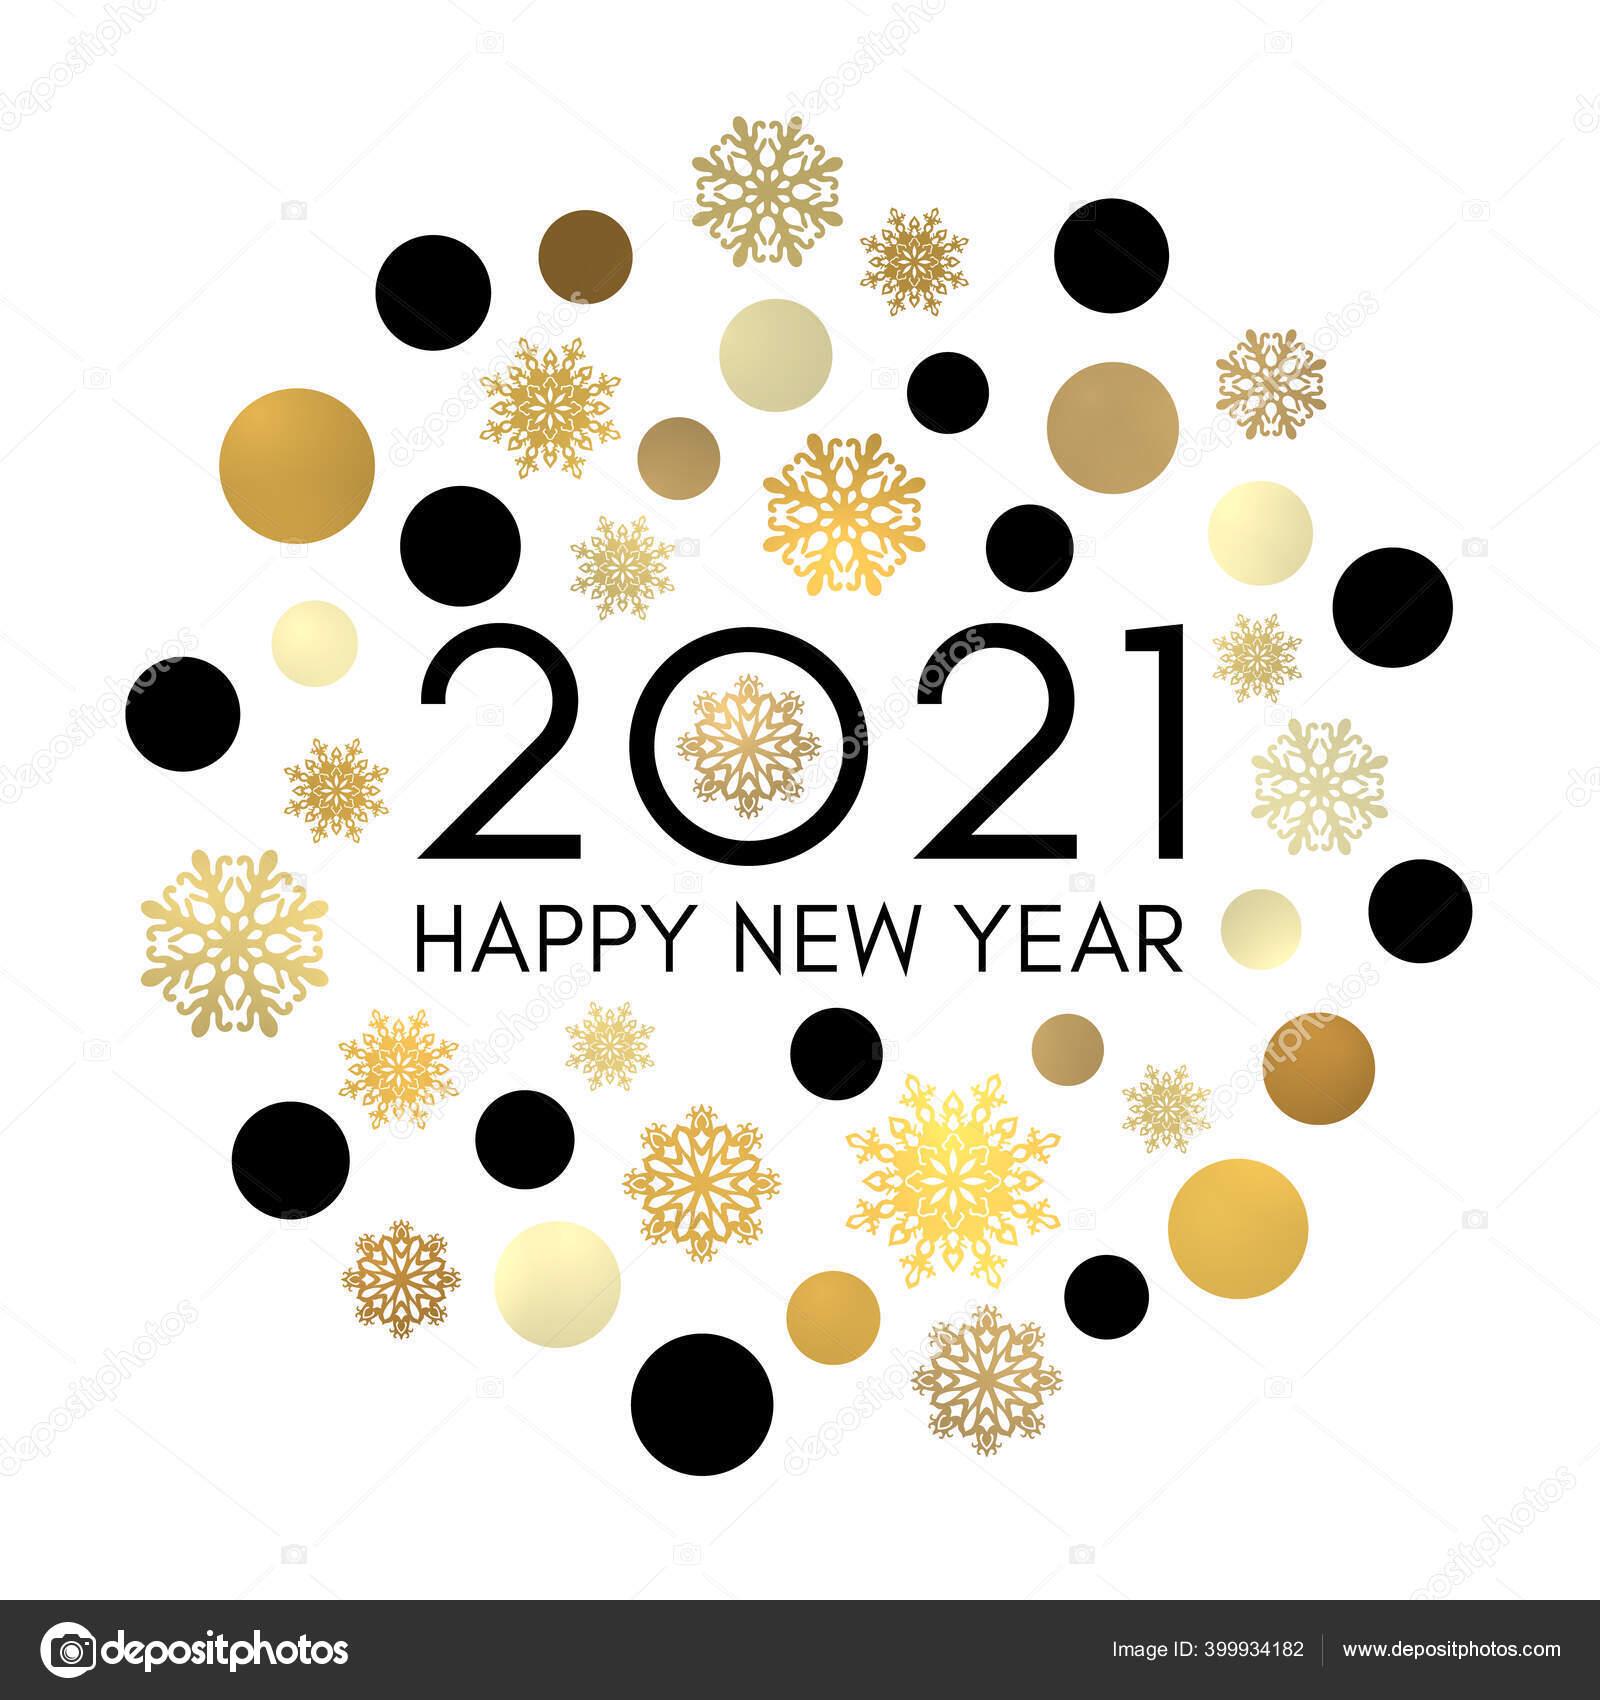 2021 Happy New Year Greeting Card Design Black Celebration Text Stock Vector C Julkirio 399934182